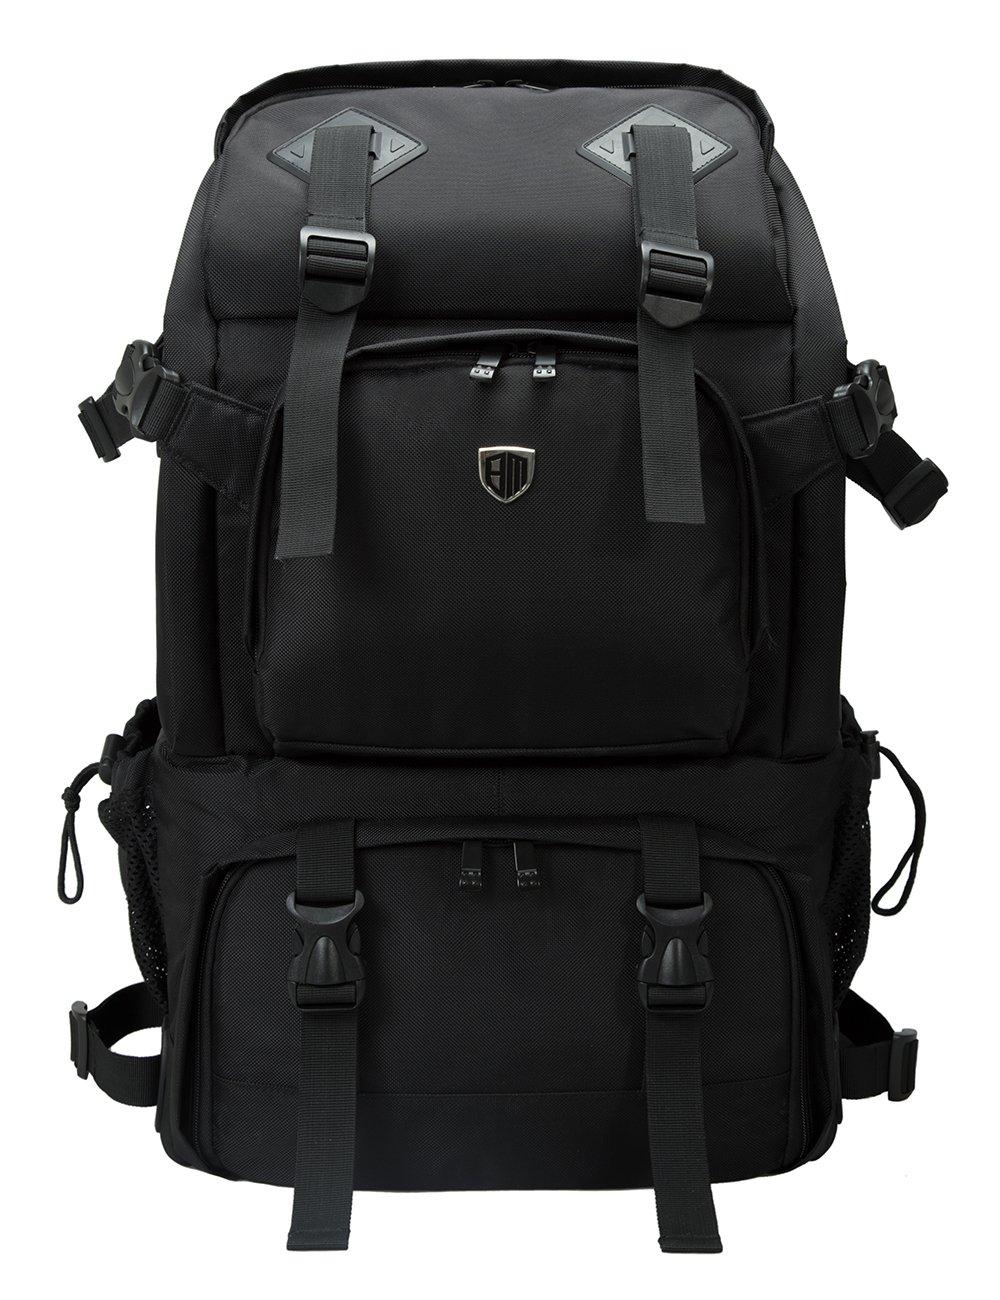 bd2274c9dba4 Amazon.com   BAGSMART Anti-Theft Professional Gear Backpack for SLR DSLR  Cameras   15